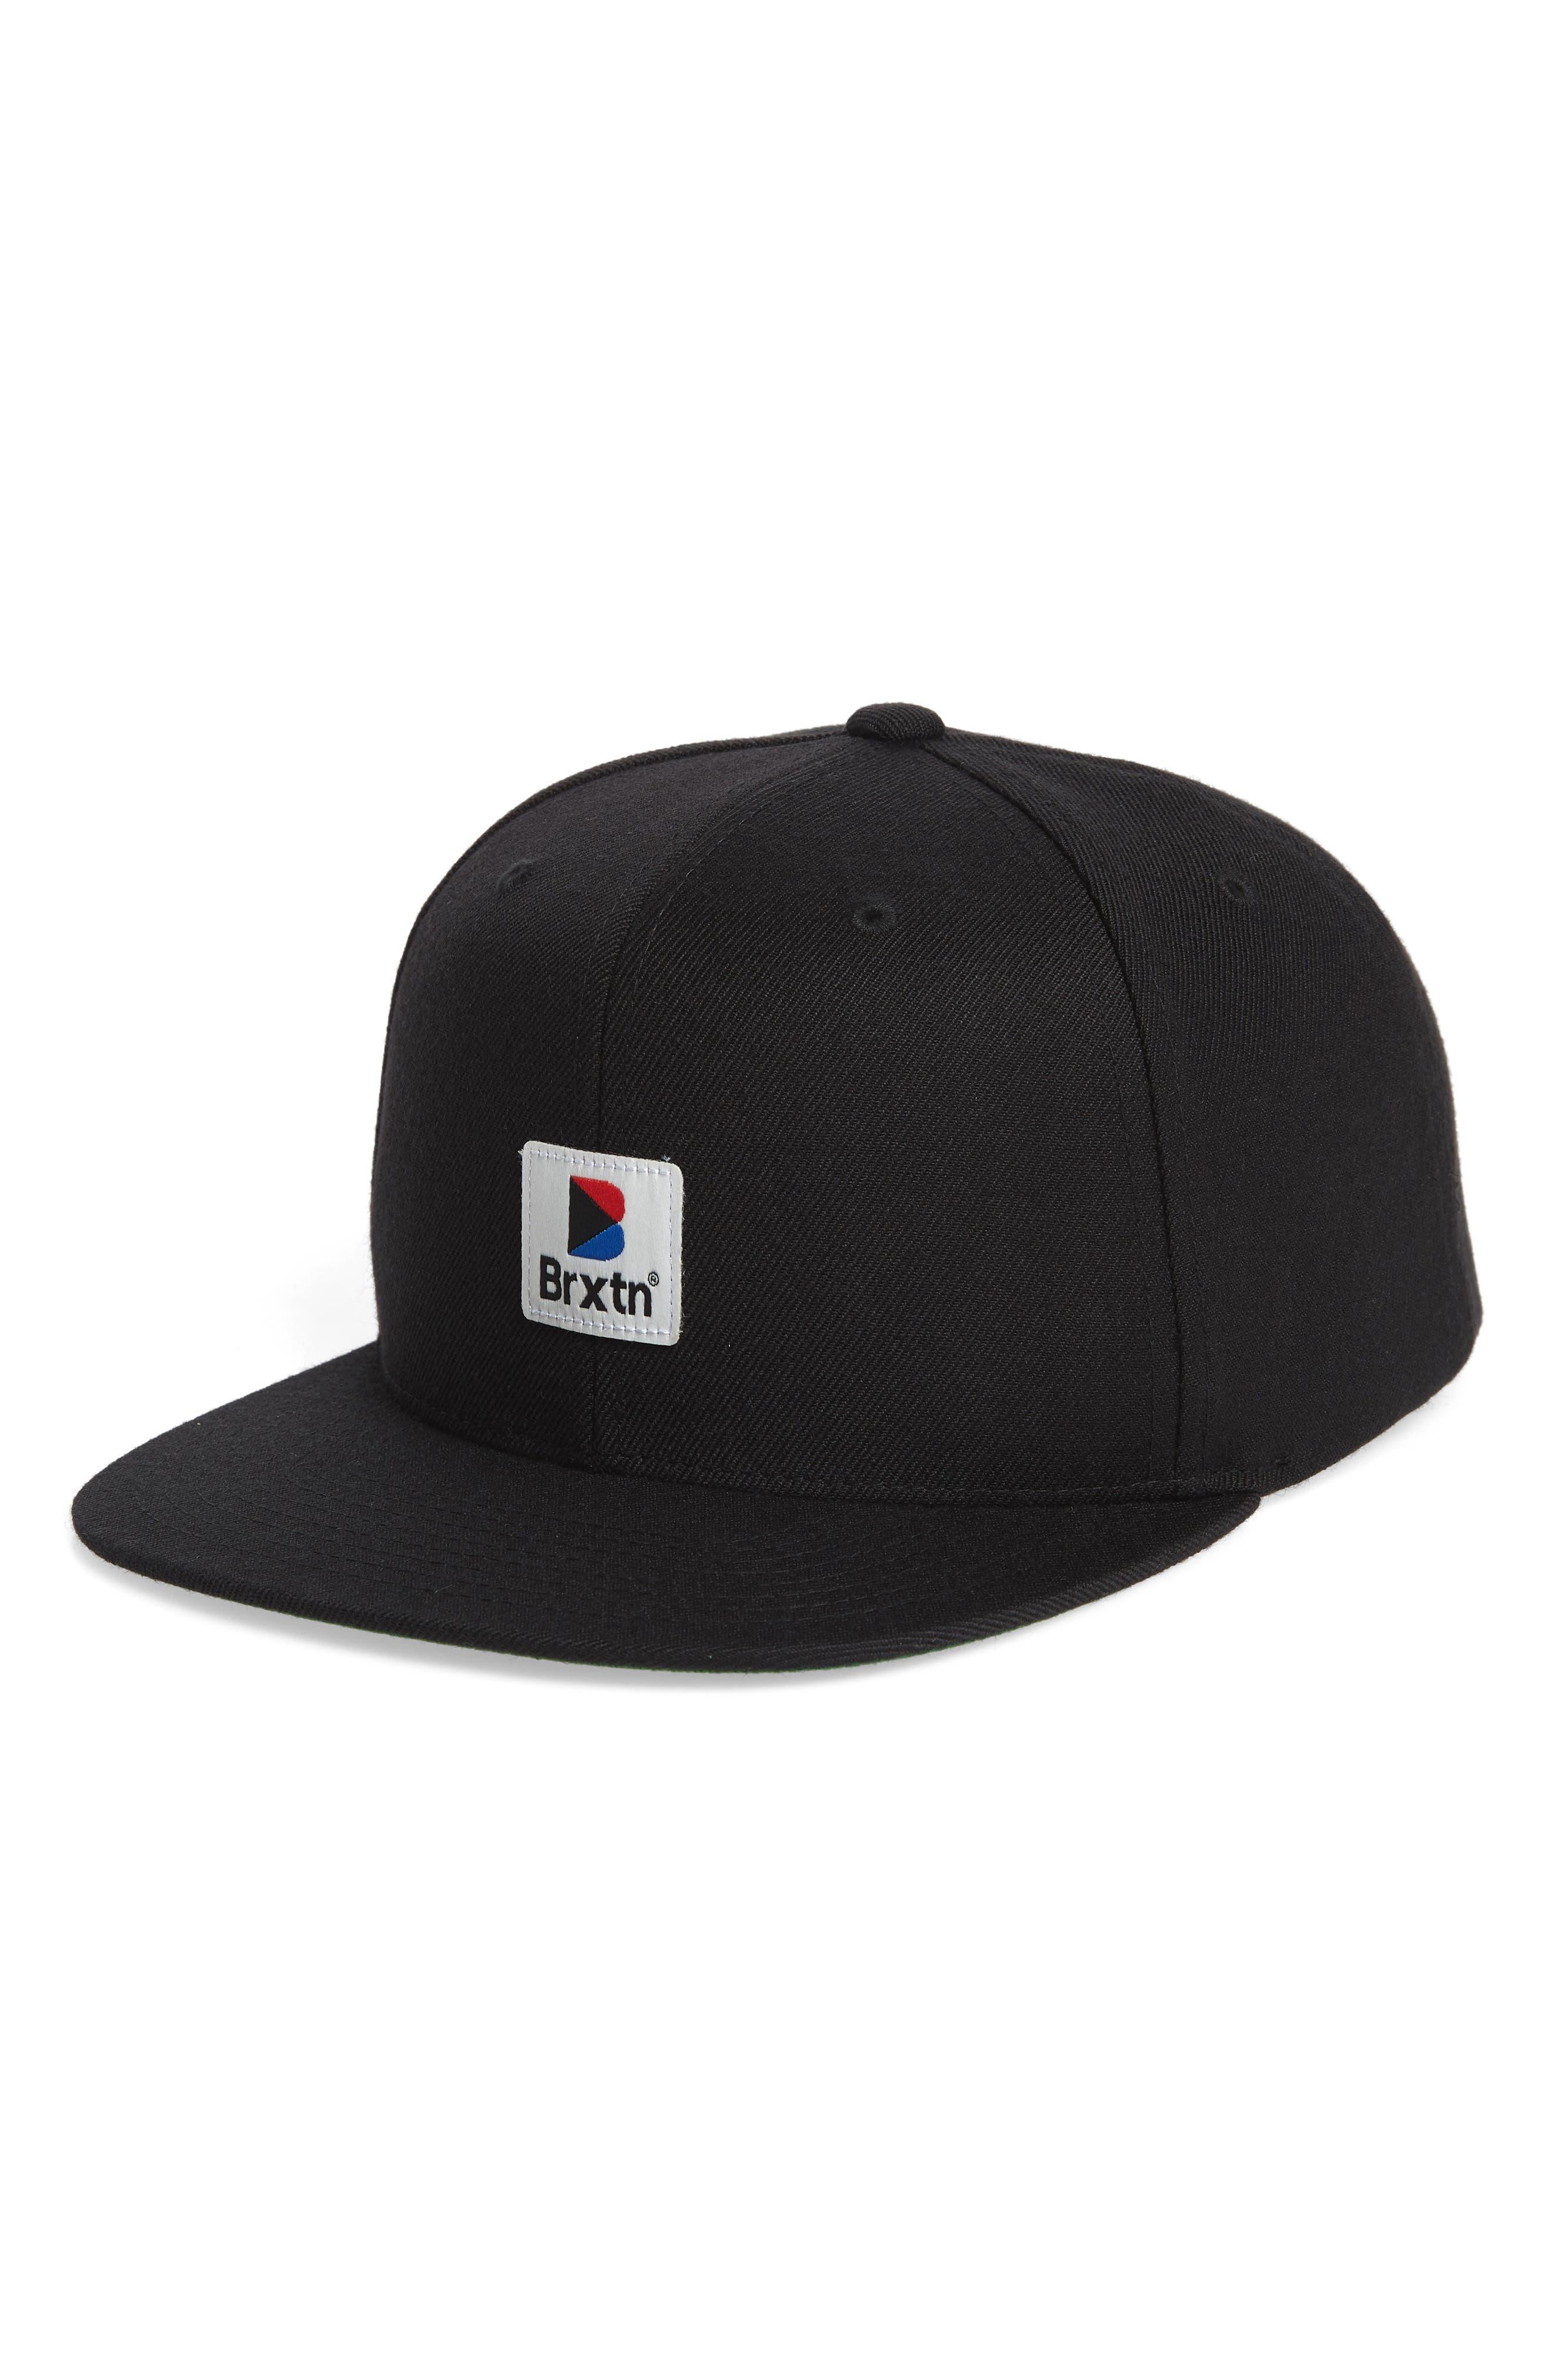 Stowell Snapback Cap,                             Main thumbnail 1, color,                             BLACK